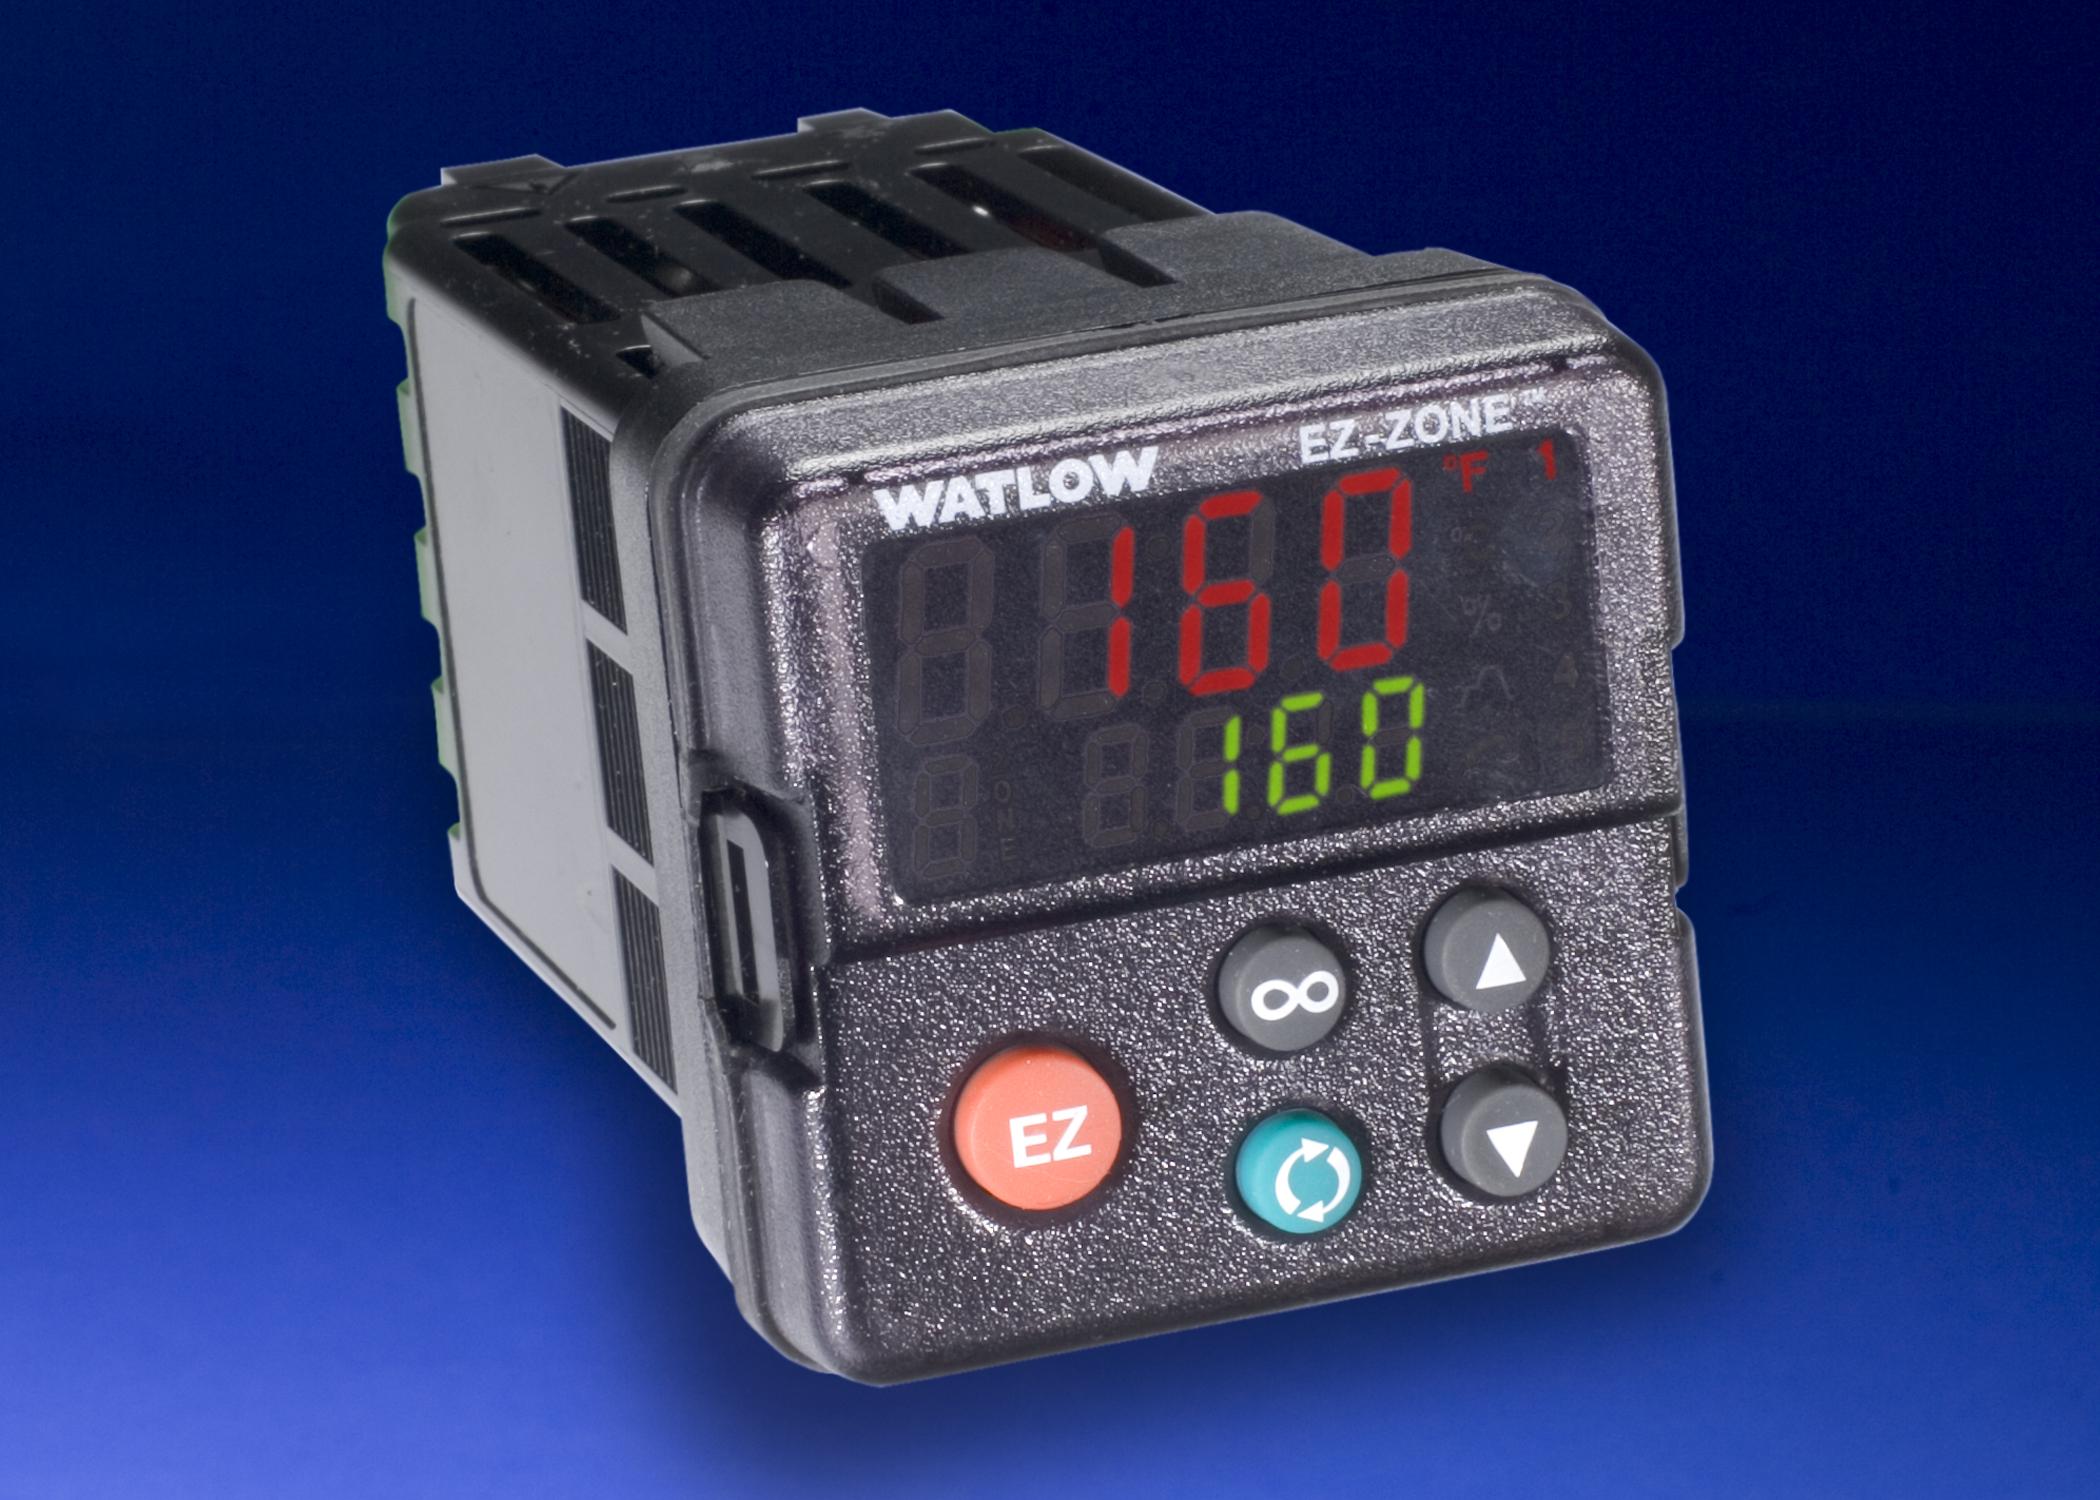 controls entherm inc ez zone pm panel mount 1 16 din controller basic watlow